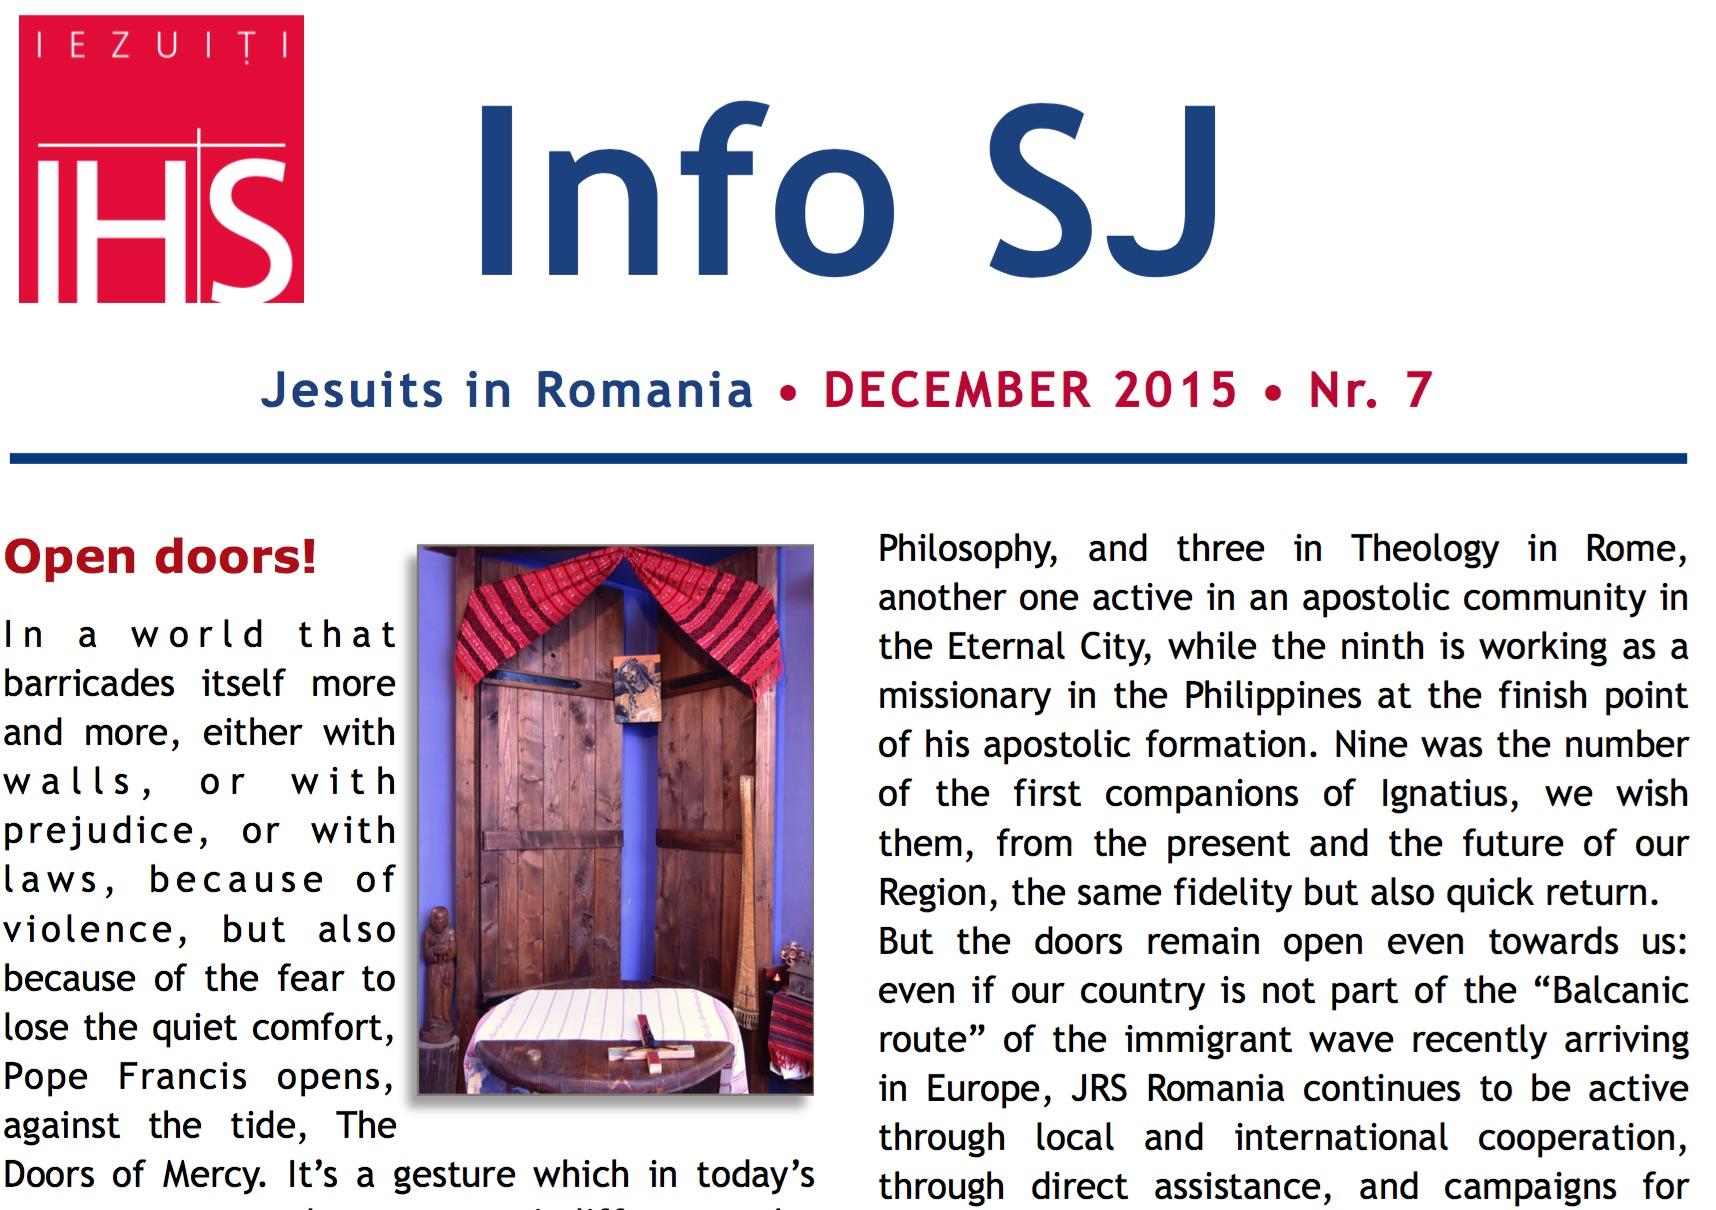 infosj-2015:12